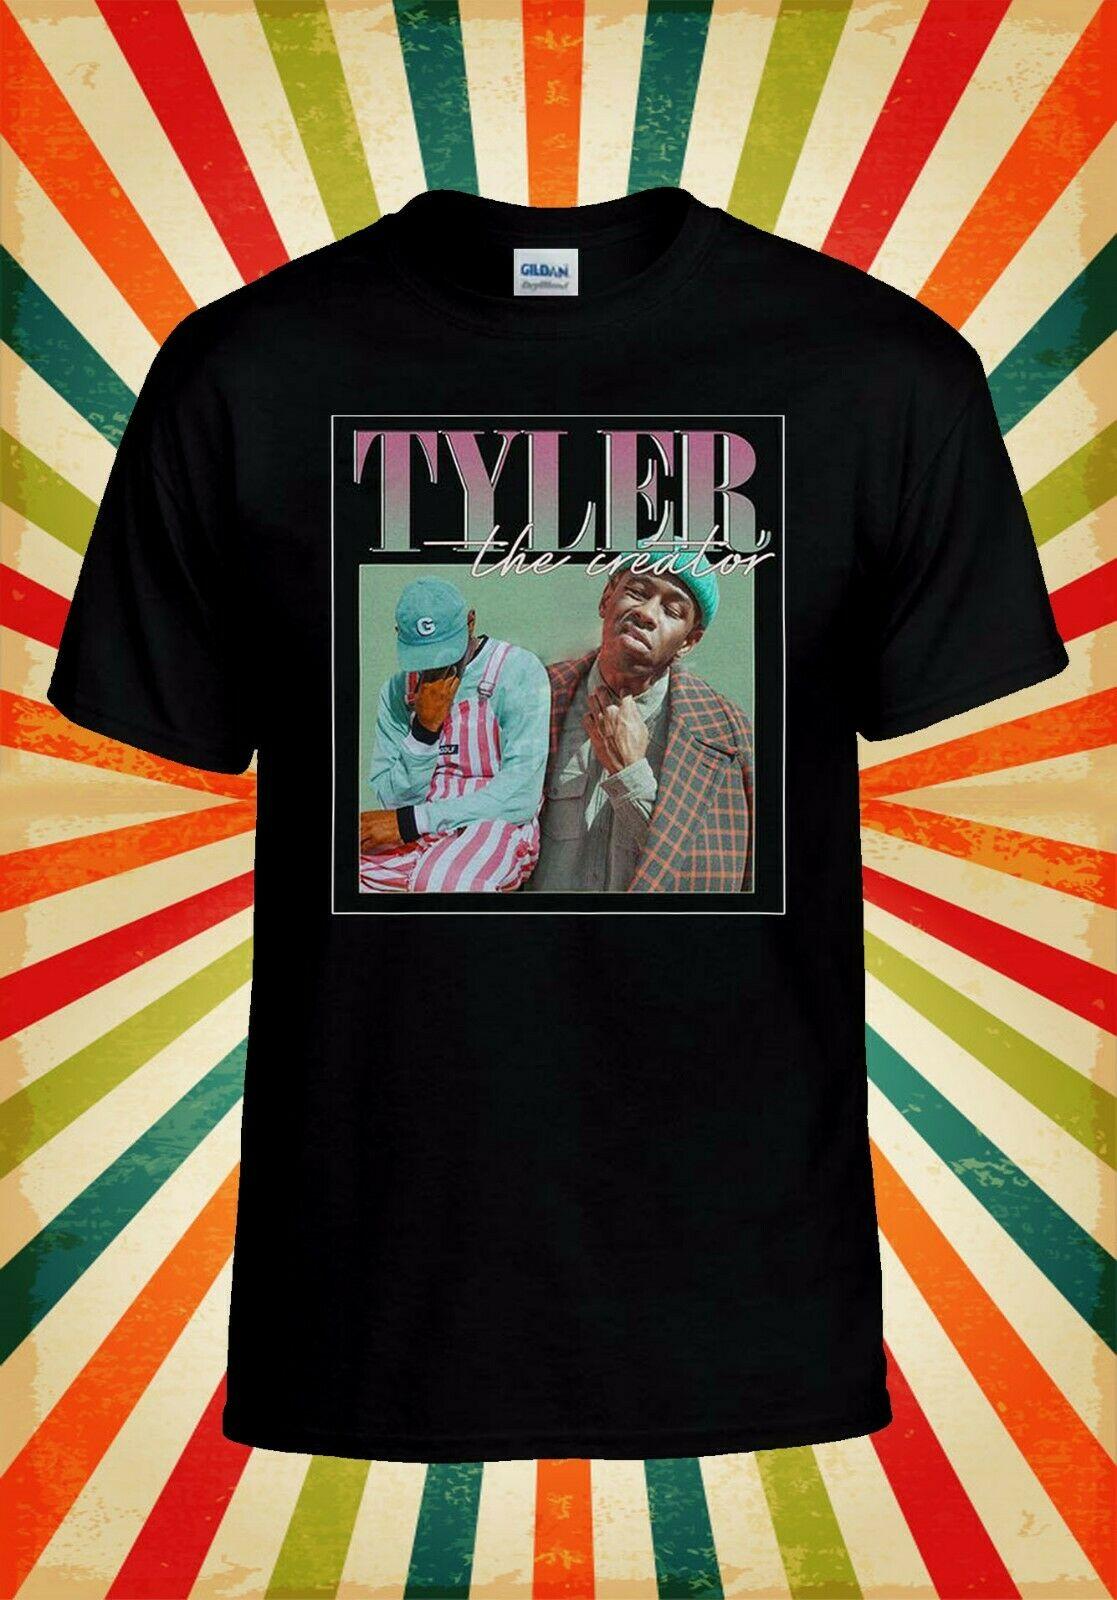 Tyler The Creator cantante de Rap divertido hombres mujeres chaleco camiseta sin mangas Unisex camiseta 2414